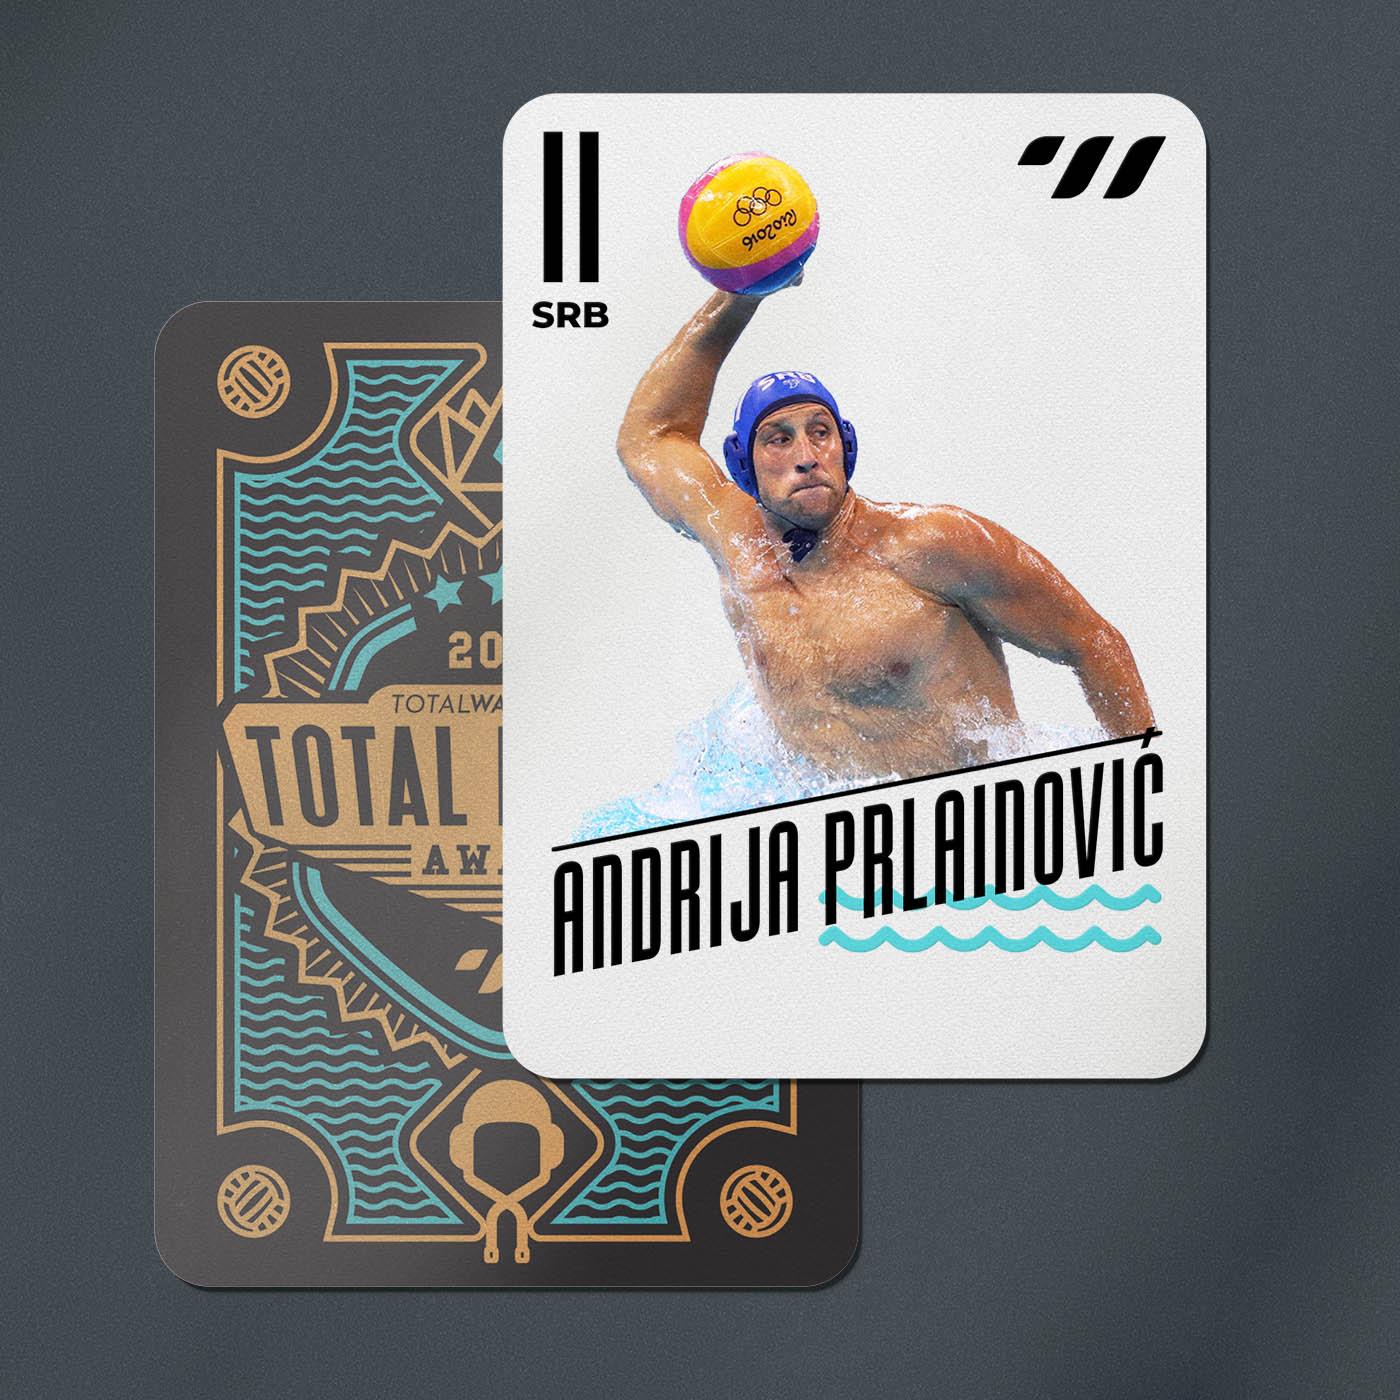 LEFT SIDE - Andrija Prlainovic (SRB)